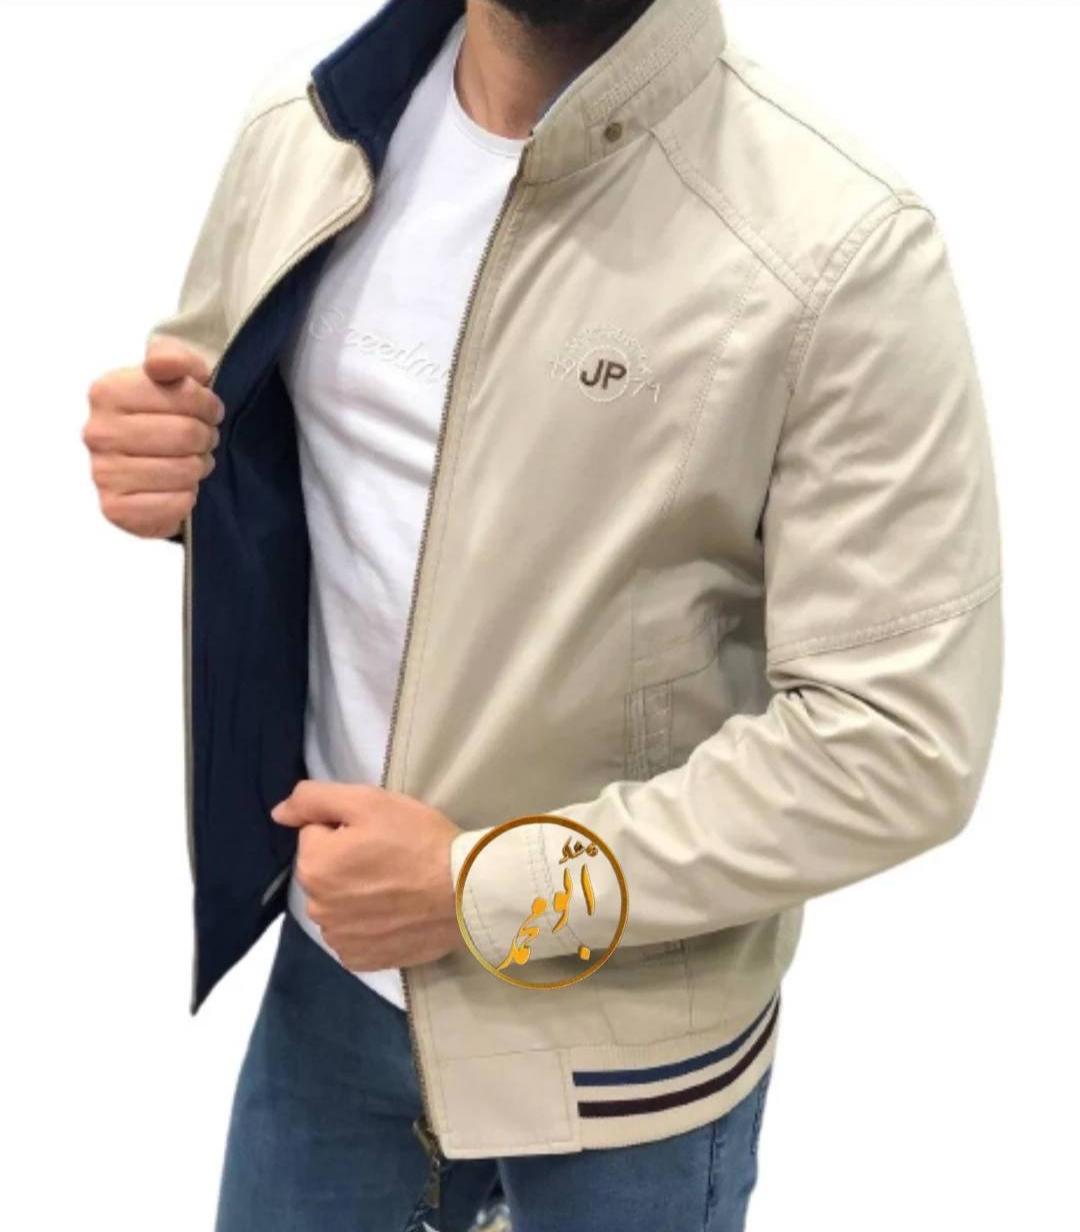 کاپشن مردانه دورو مارک جیپ سفیداستخونی آبی